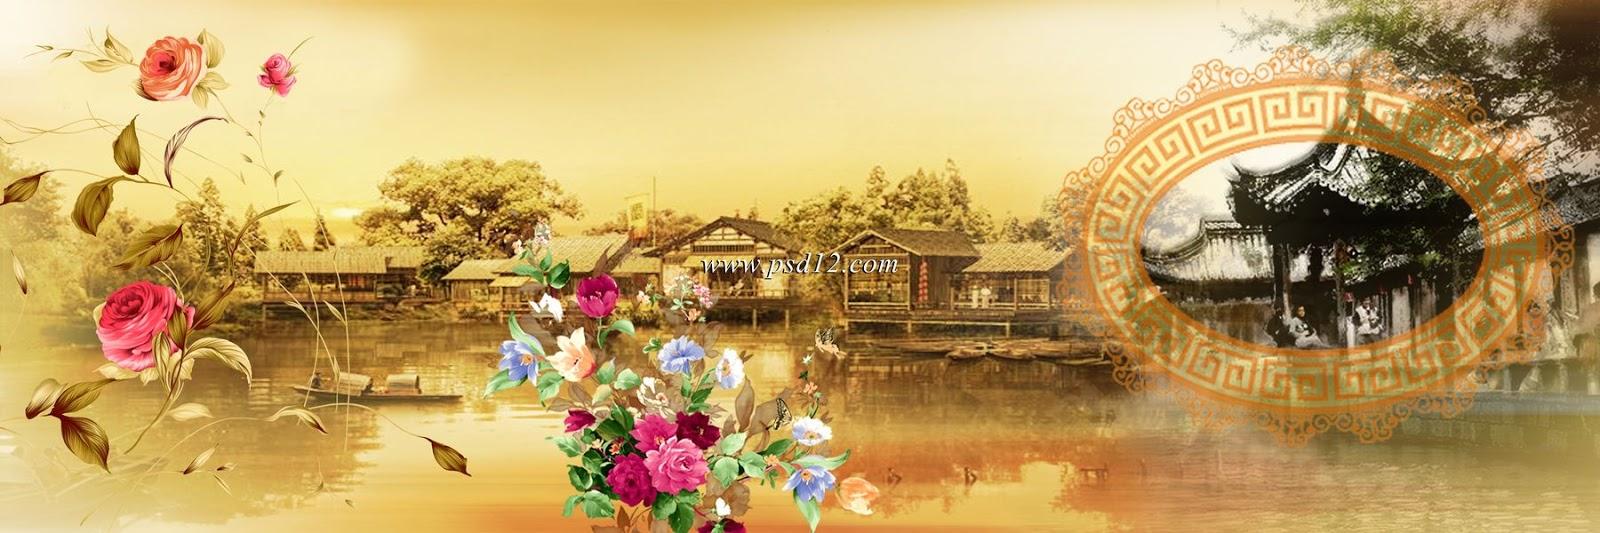 Wedding Album Design 12x36 Psd Files 11 Photoshop Backgrounds